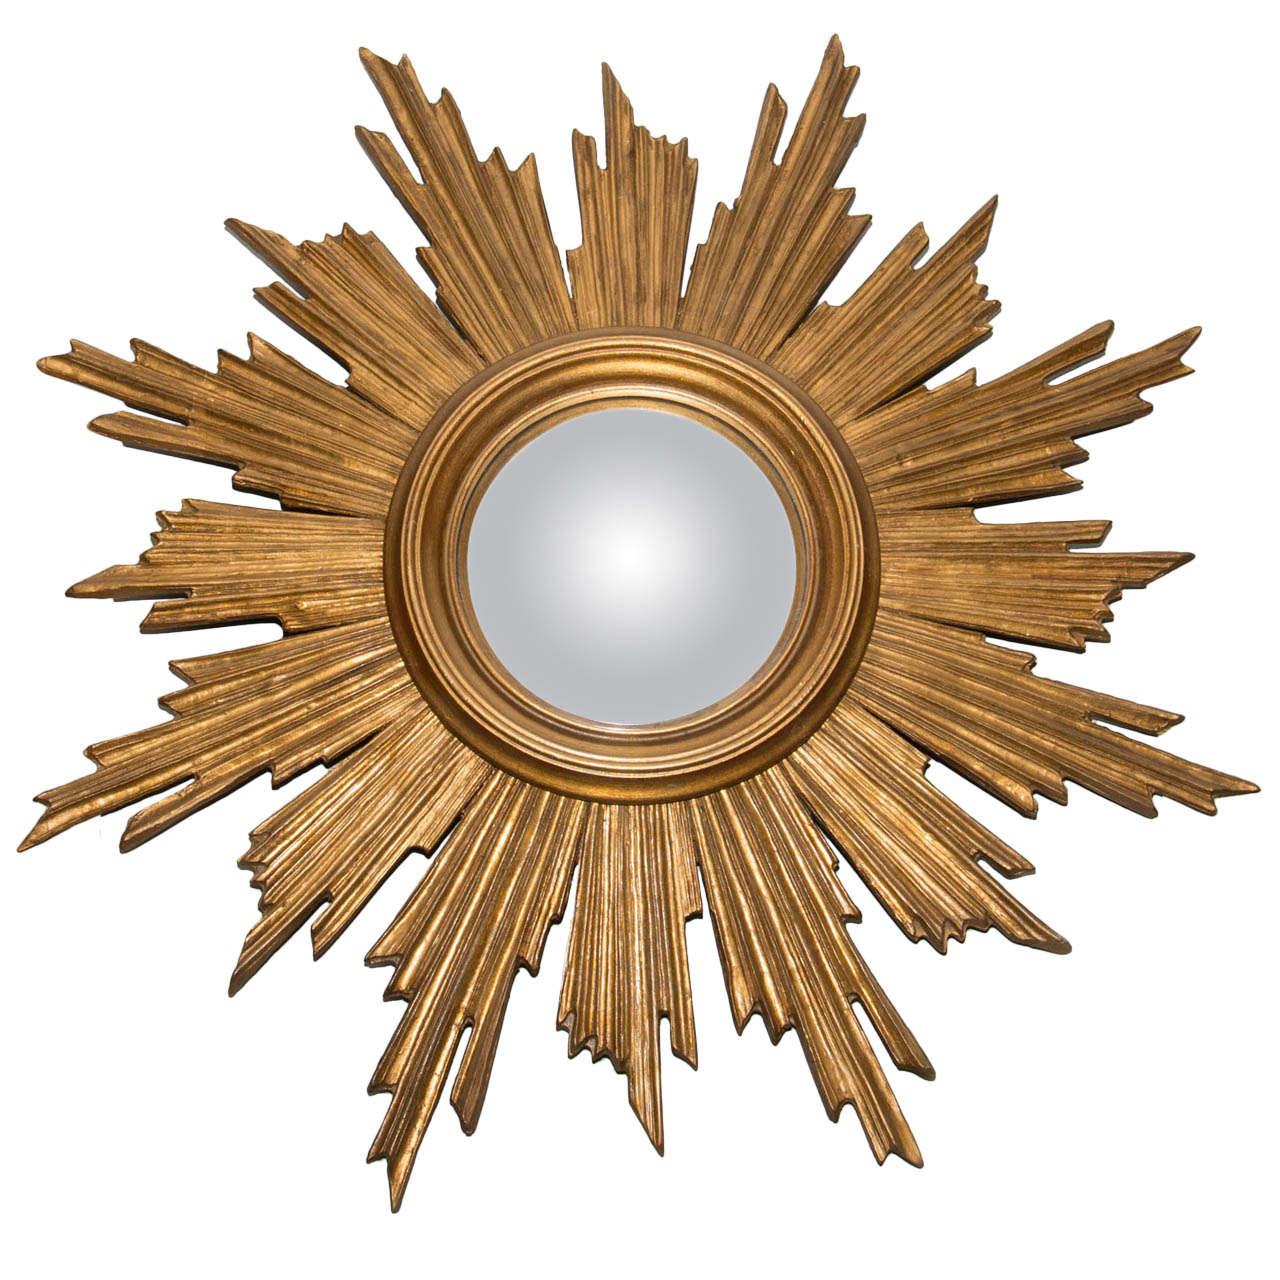 Giltwood sunburst mirror at 1stdibs for Sunburst mirror